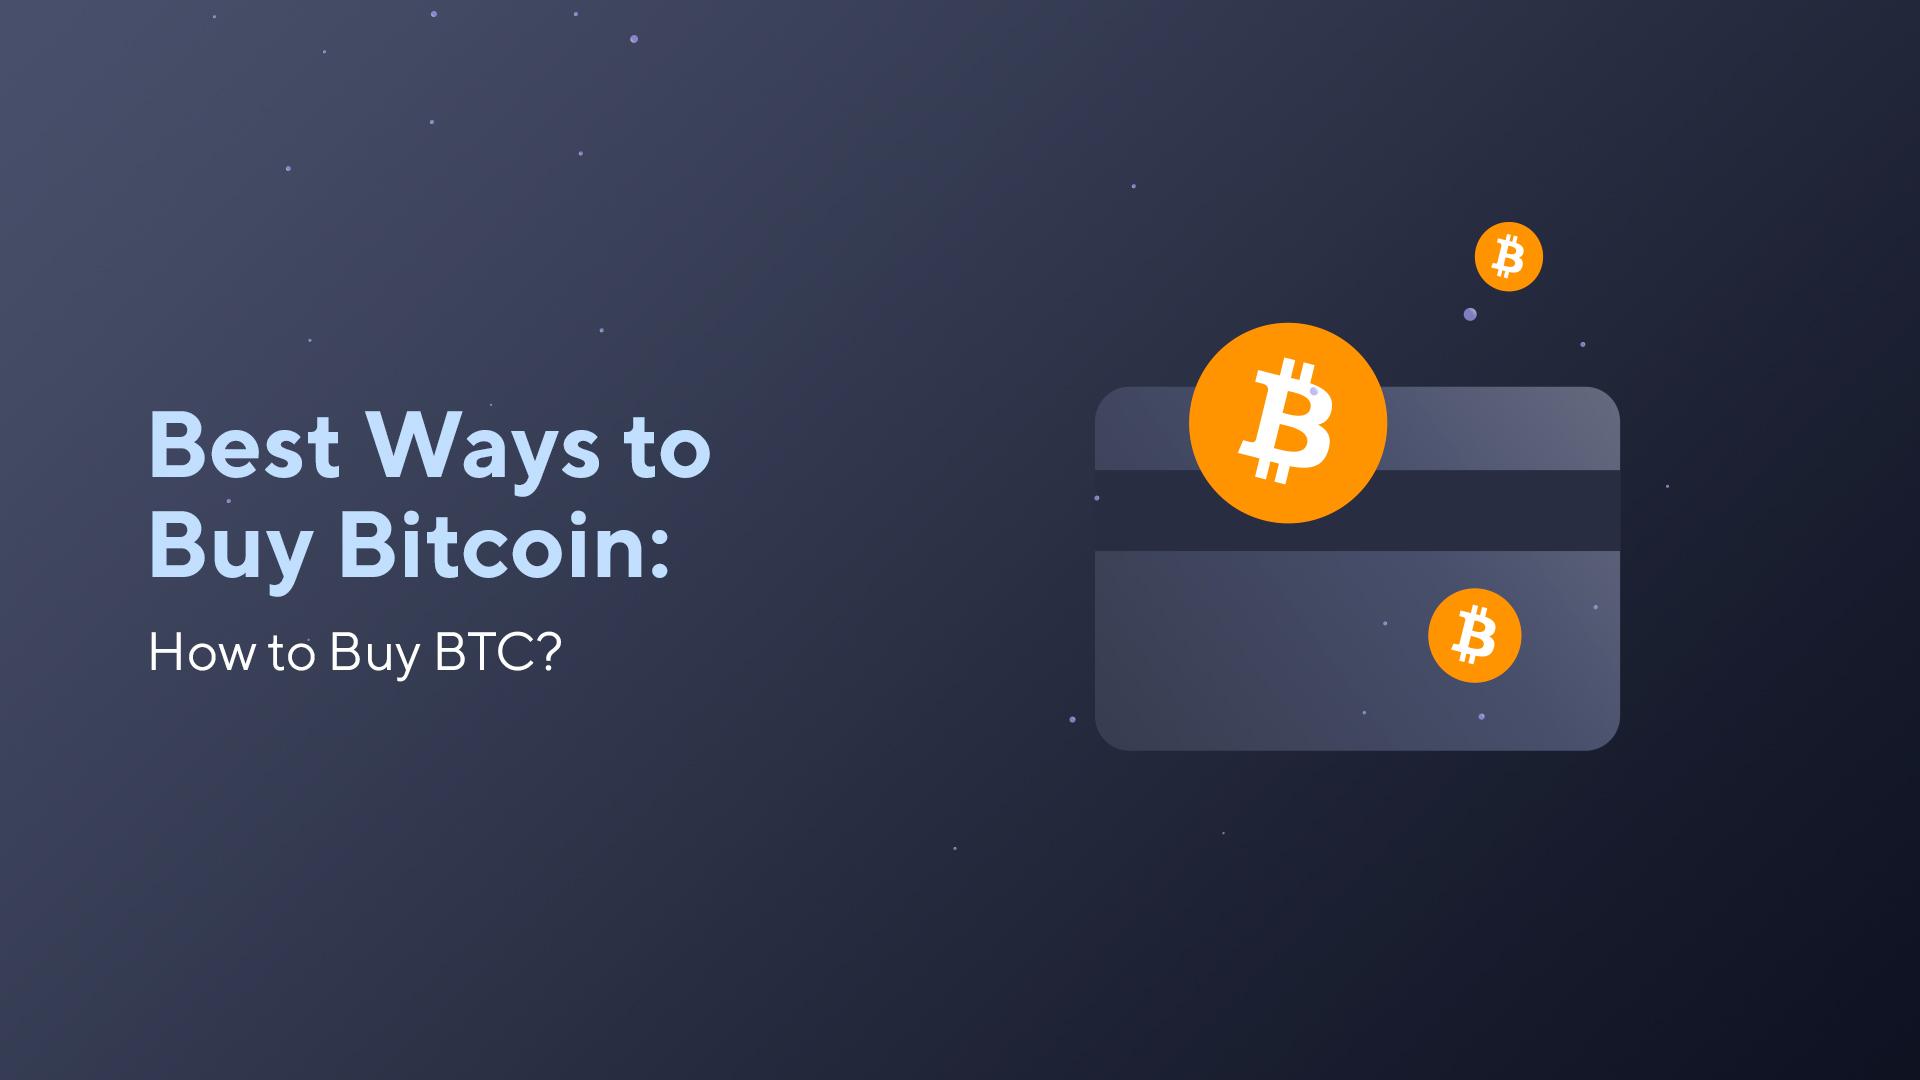 Best Ways to Buy Bitcoin: How to Buy BTC?